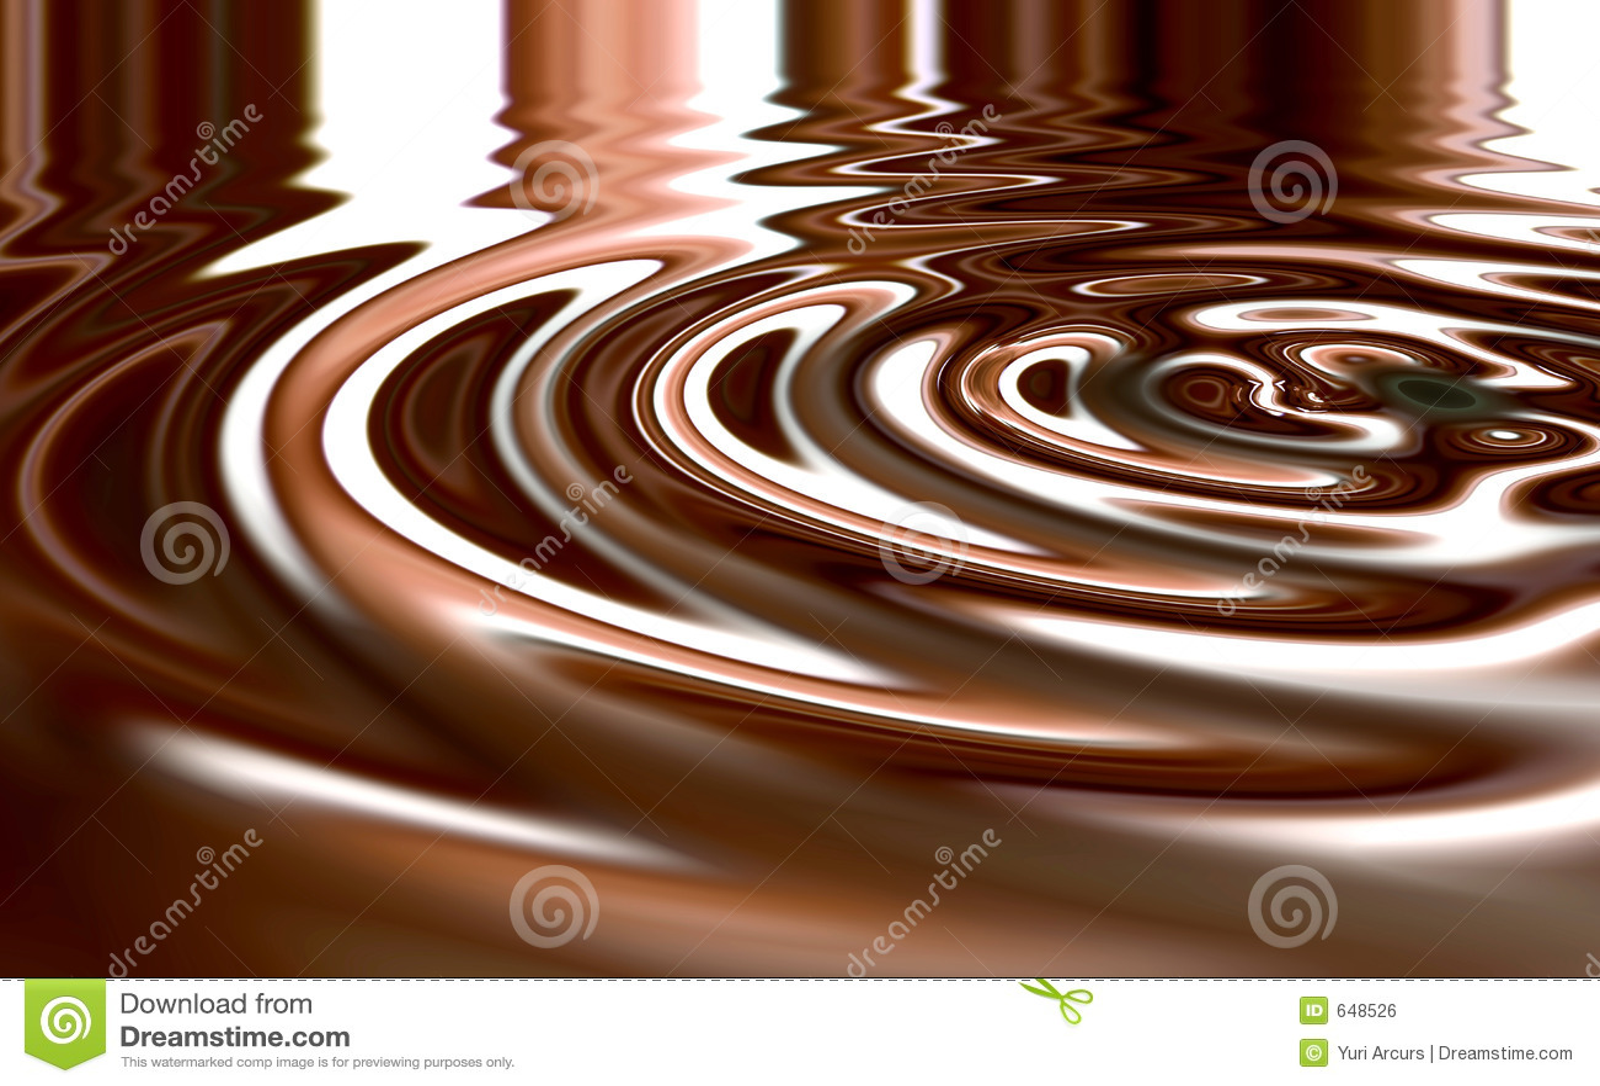 Animated Chocolate Waves Stock Photo Image Of Choco Lava